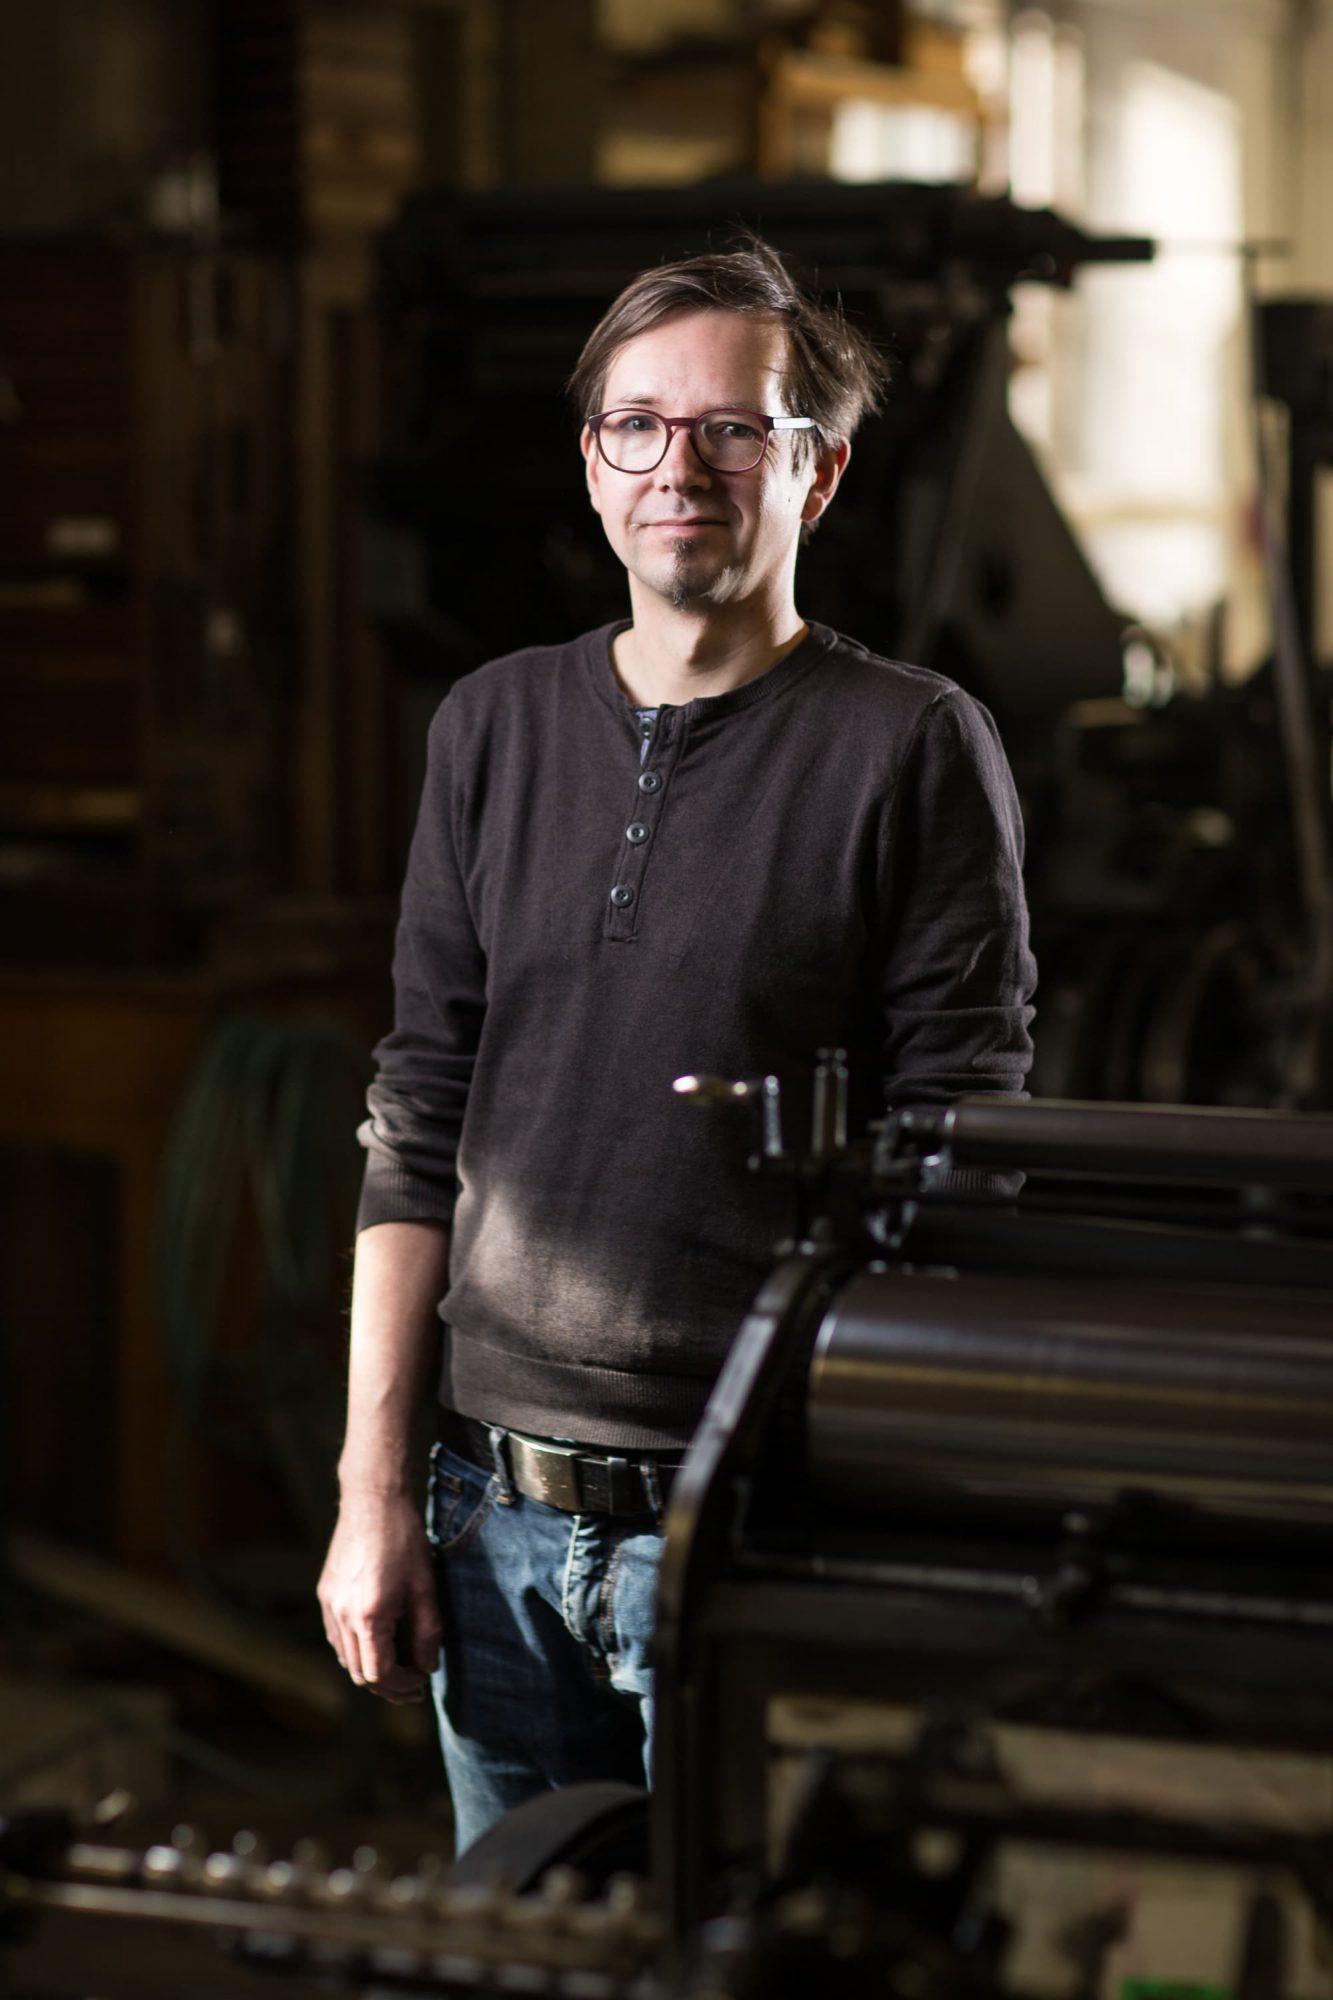 Regentaucher Portraitfotografie | Thomas Siemon